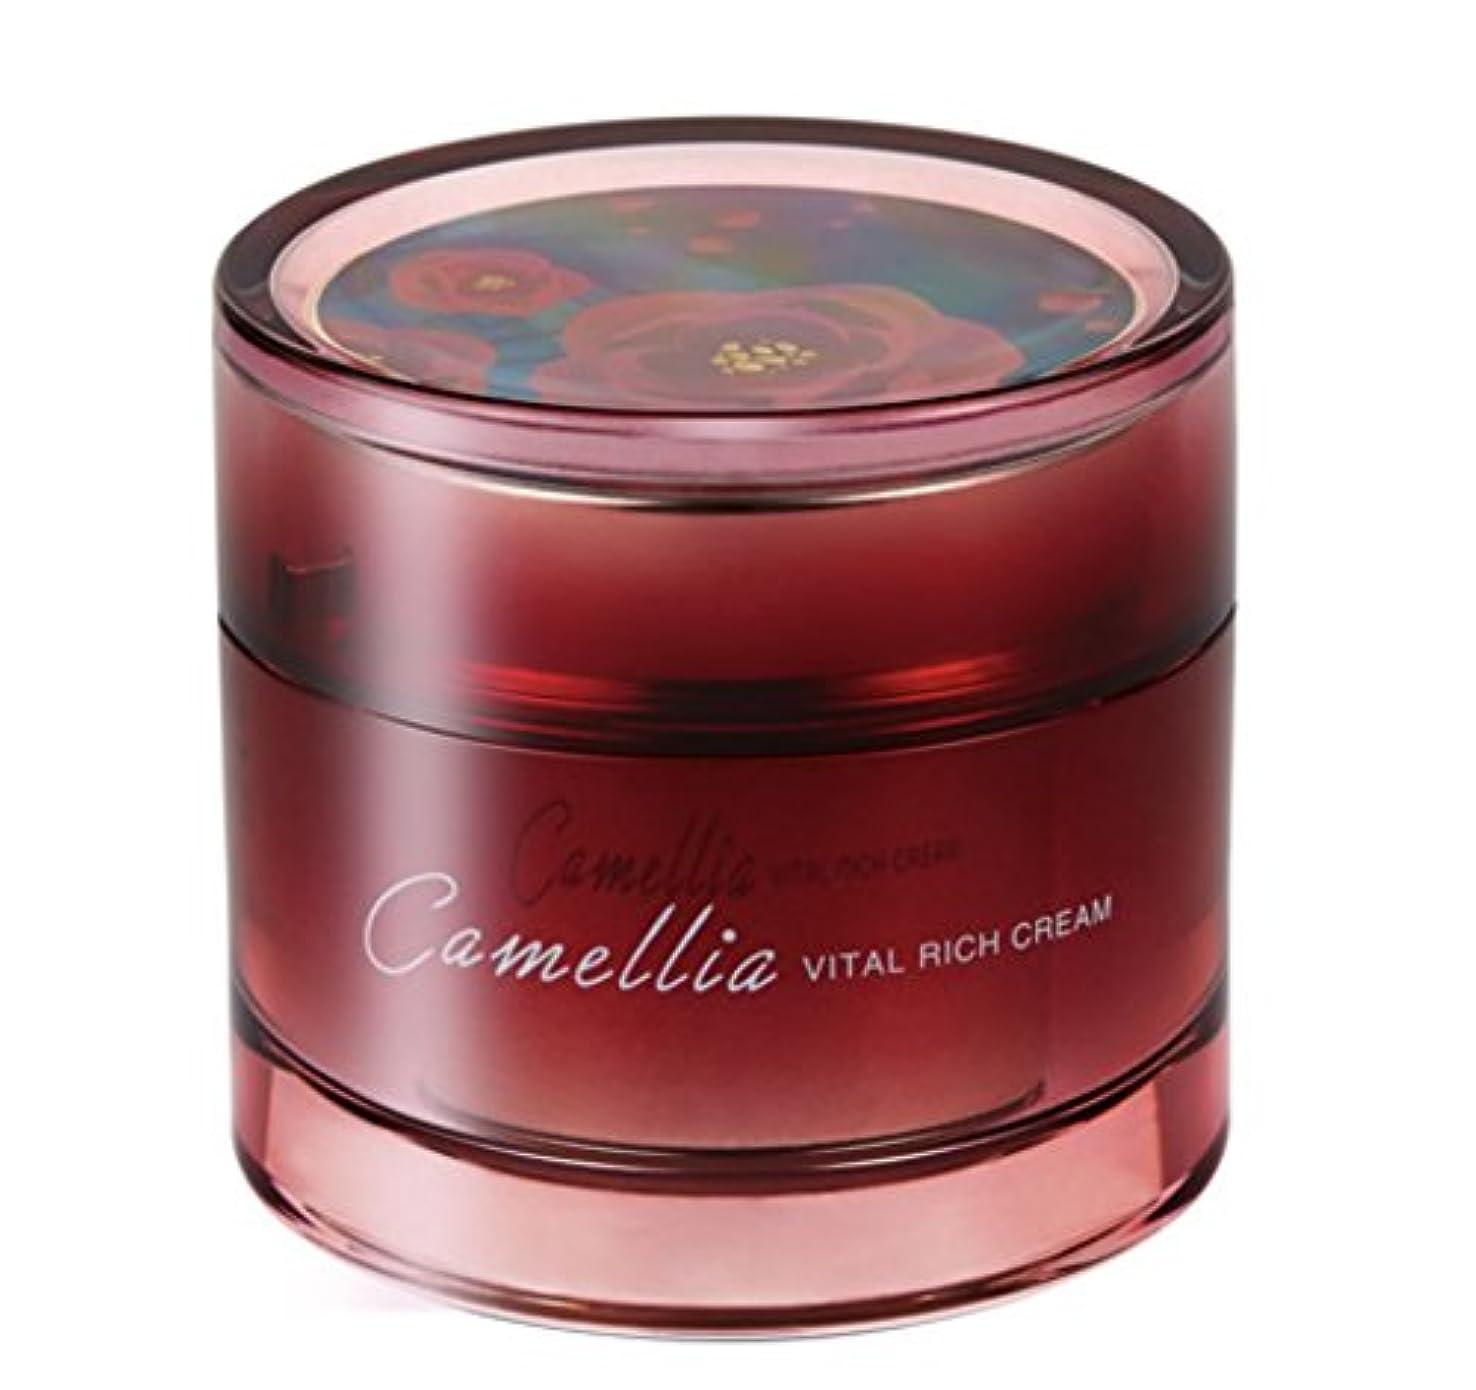 炭素絶望状態Jeju Indi Camellia Vital Rich Cream 50g/Eco-Friendly Jeju Island Cosmetic/Korea Cosmetics [並行輸入品]